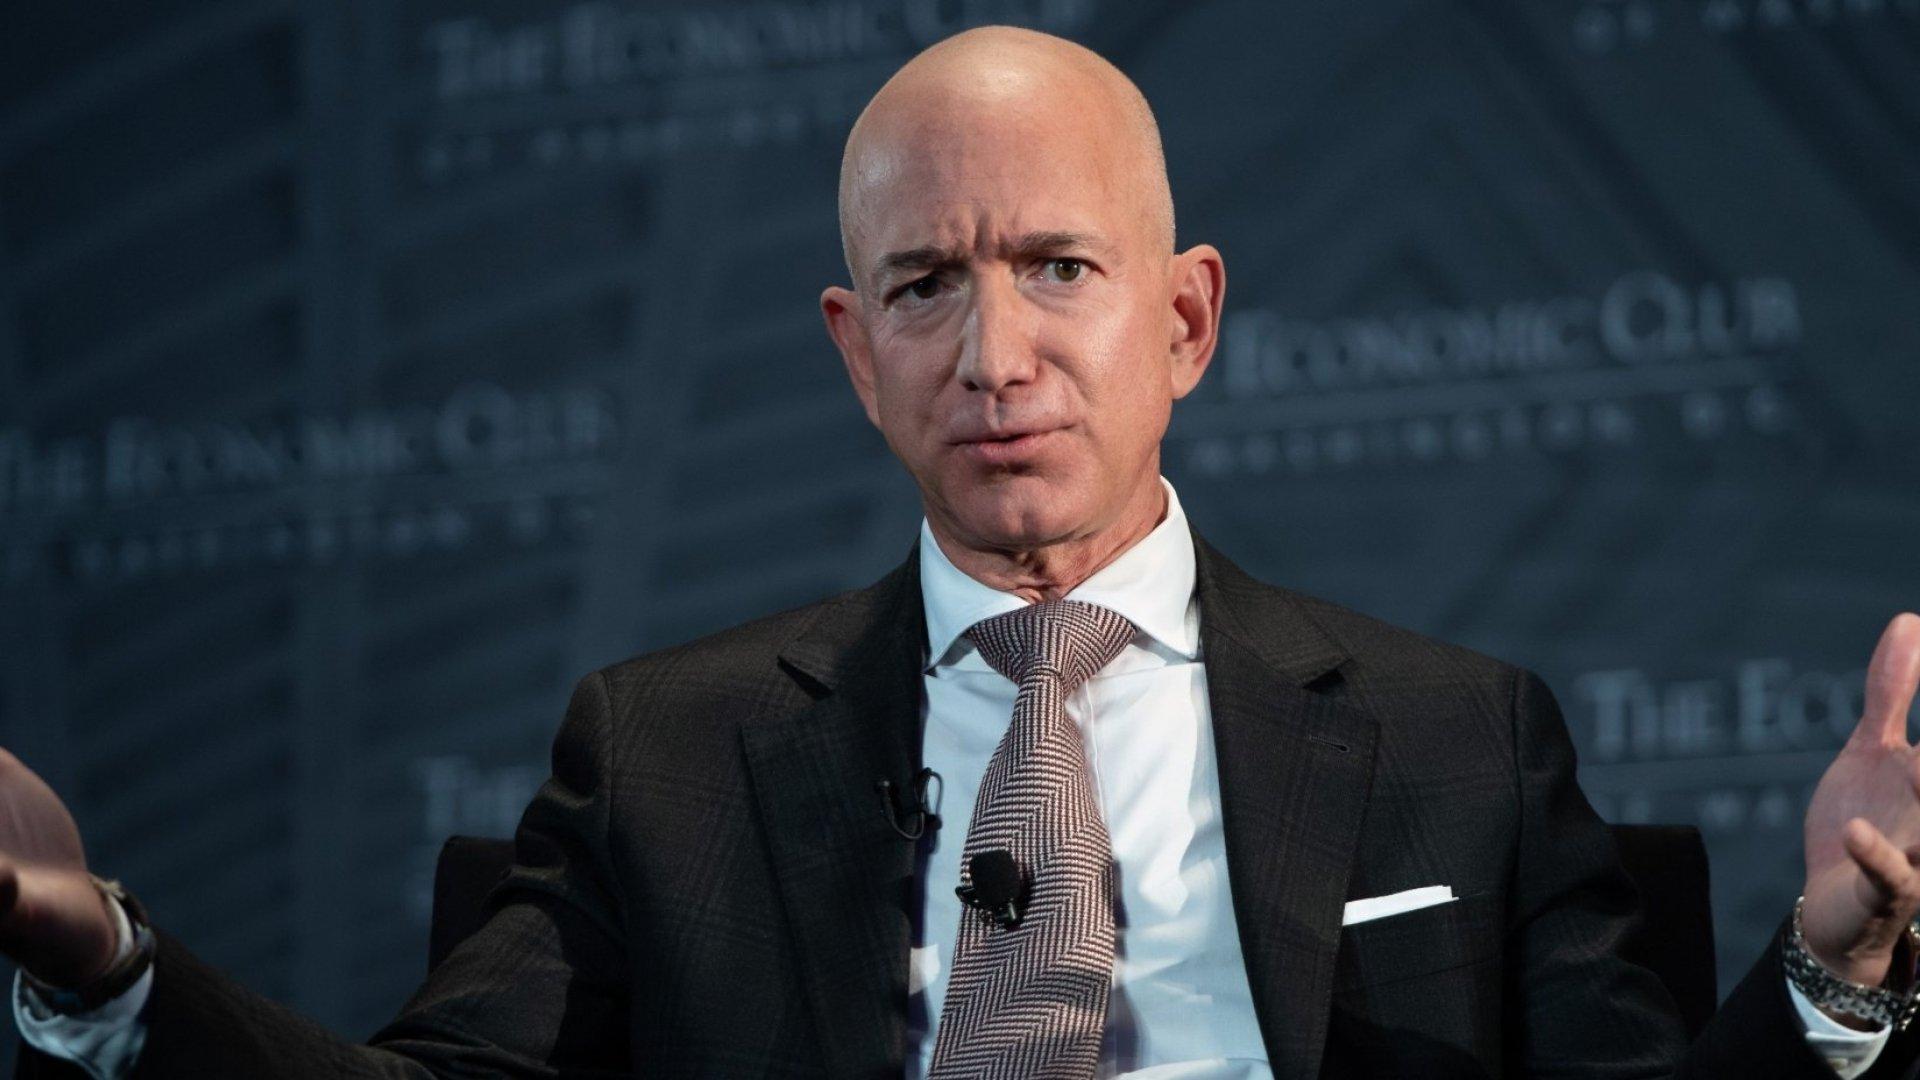 Report: Amazon's HQ2 Search Grew Out of Jeff Bezos's Tesla Envy